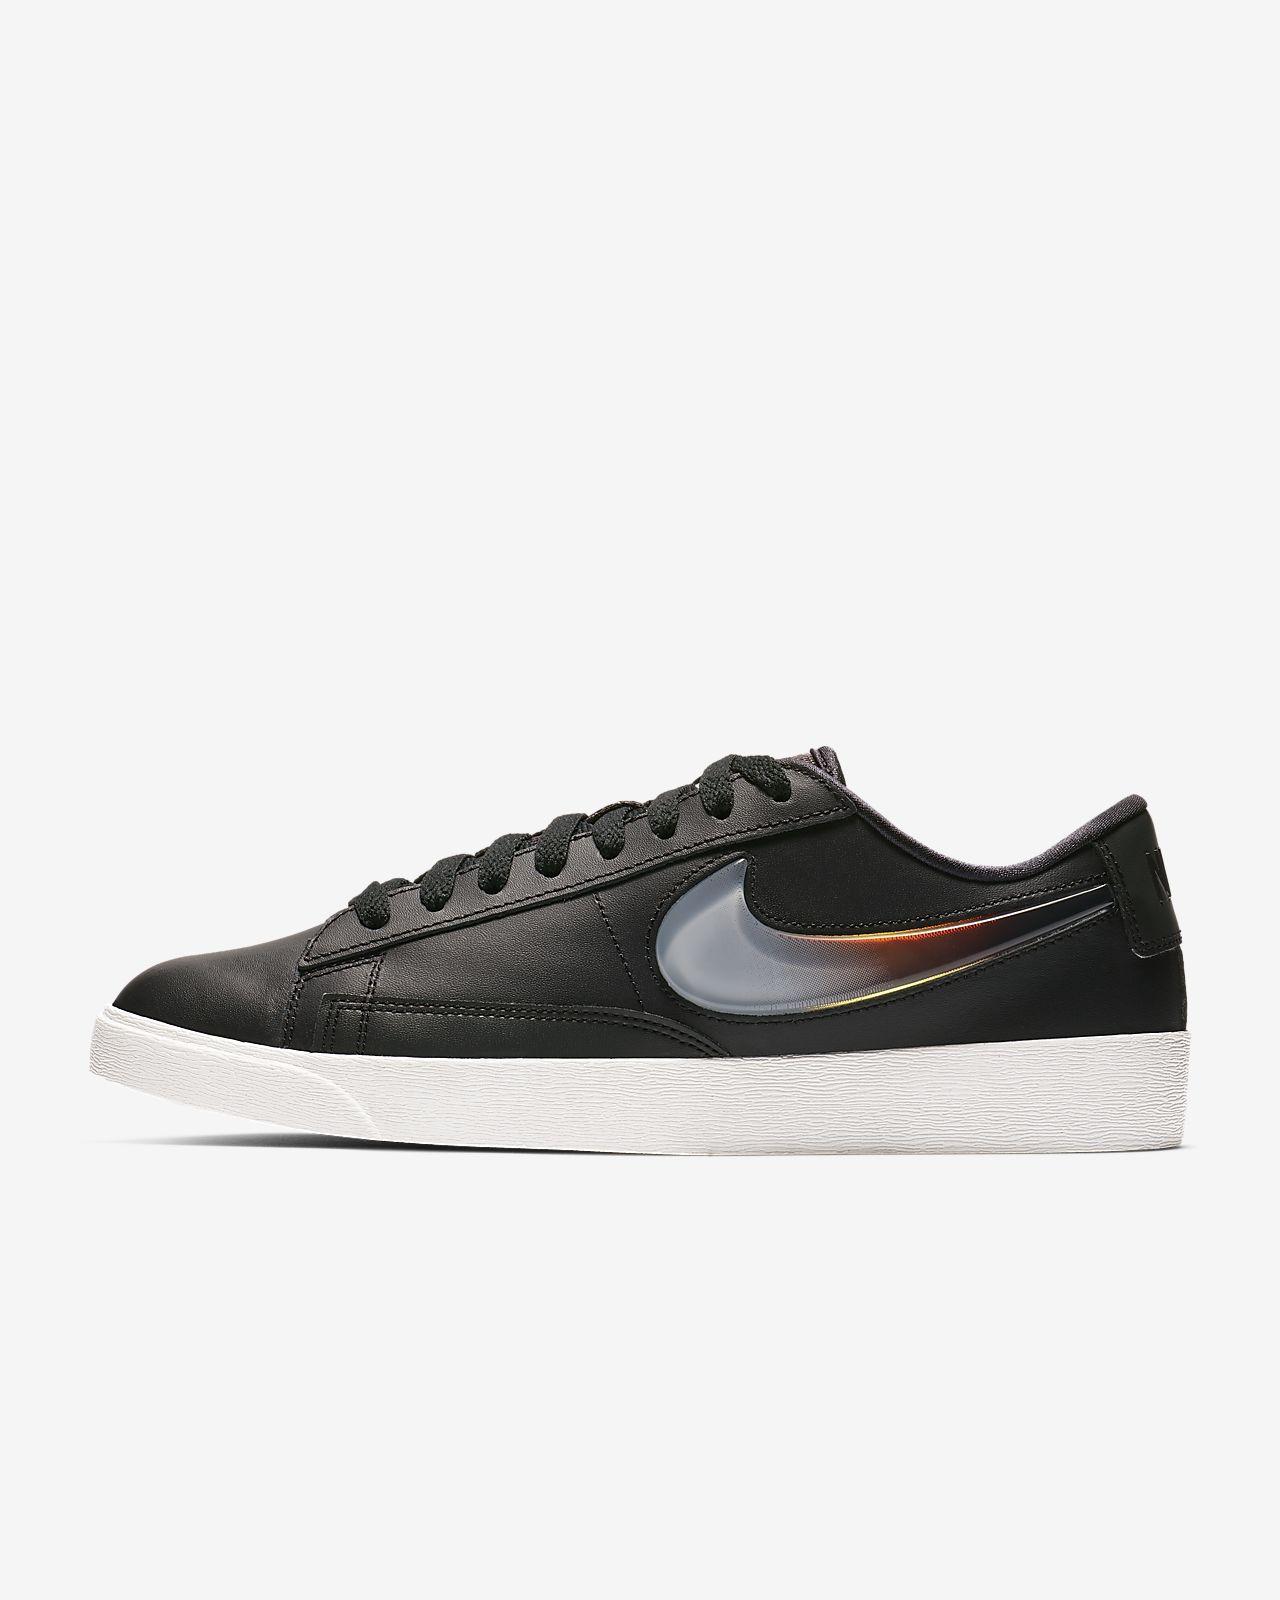 Pour Blazer Lux Premium Nike Chaussure FemmeCa Low 45AqLj3R